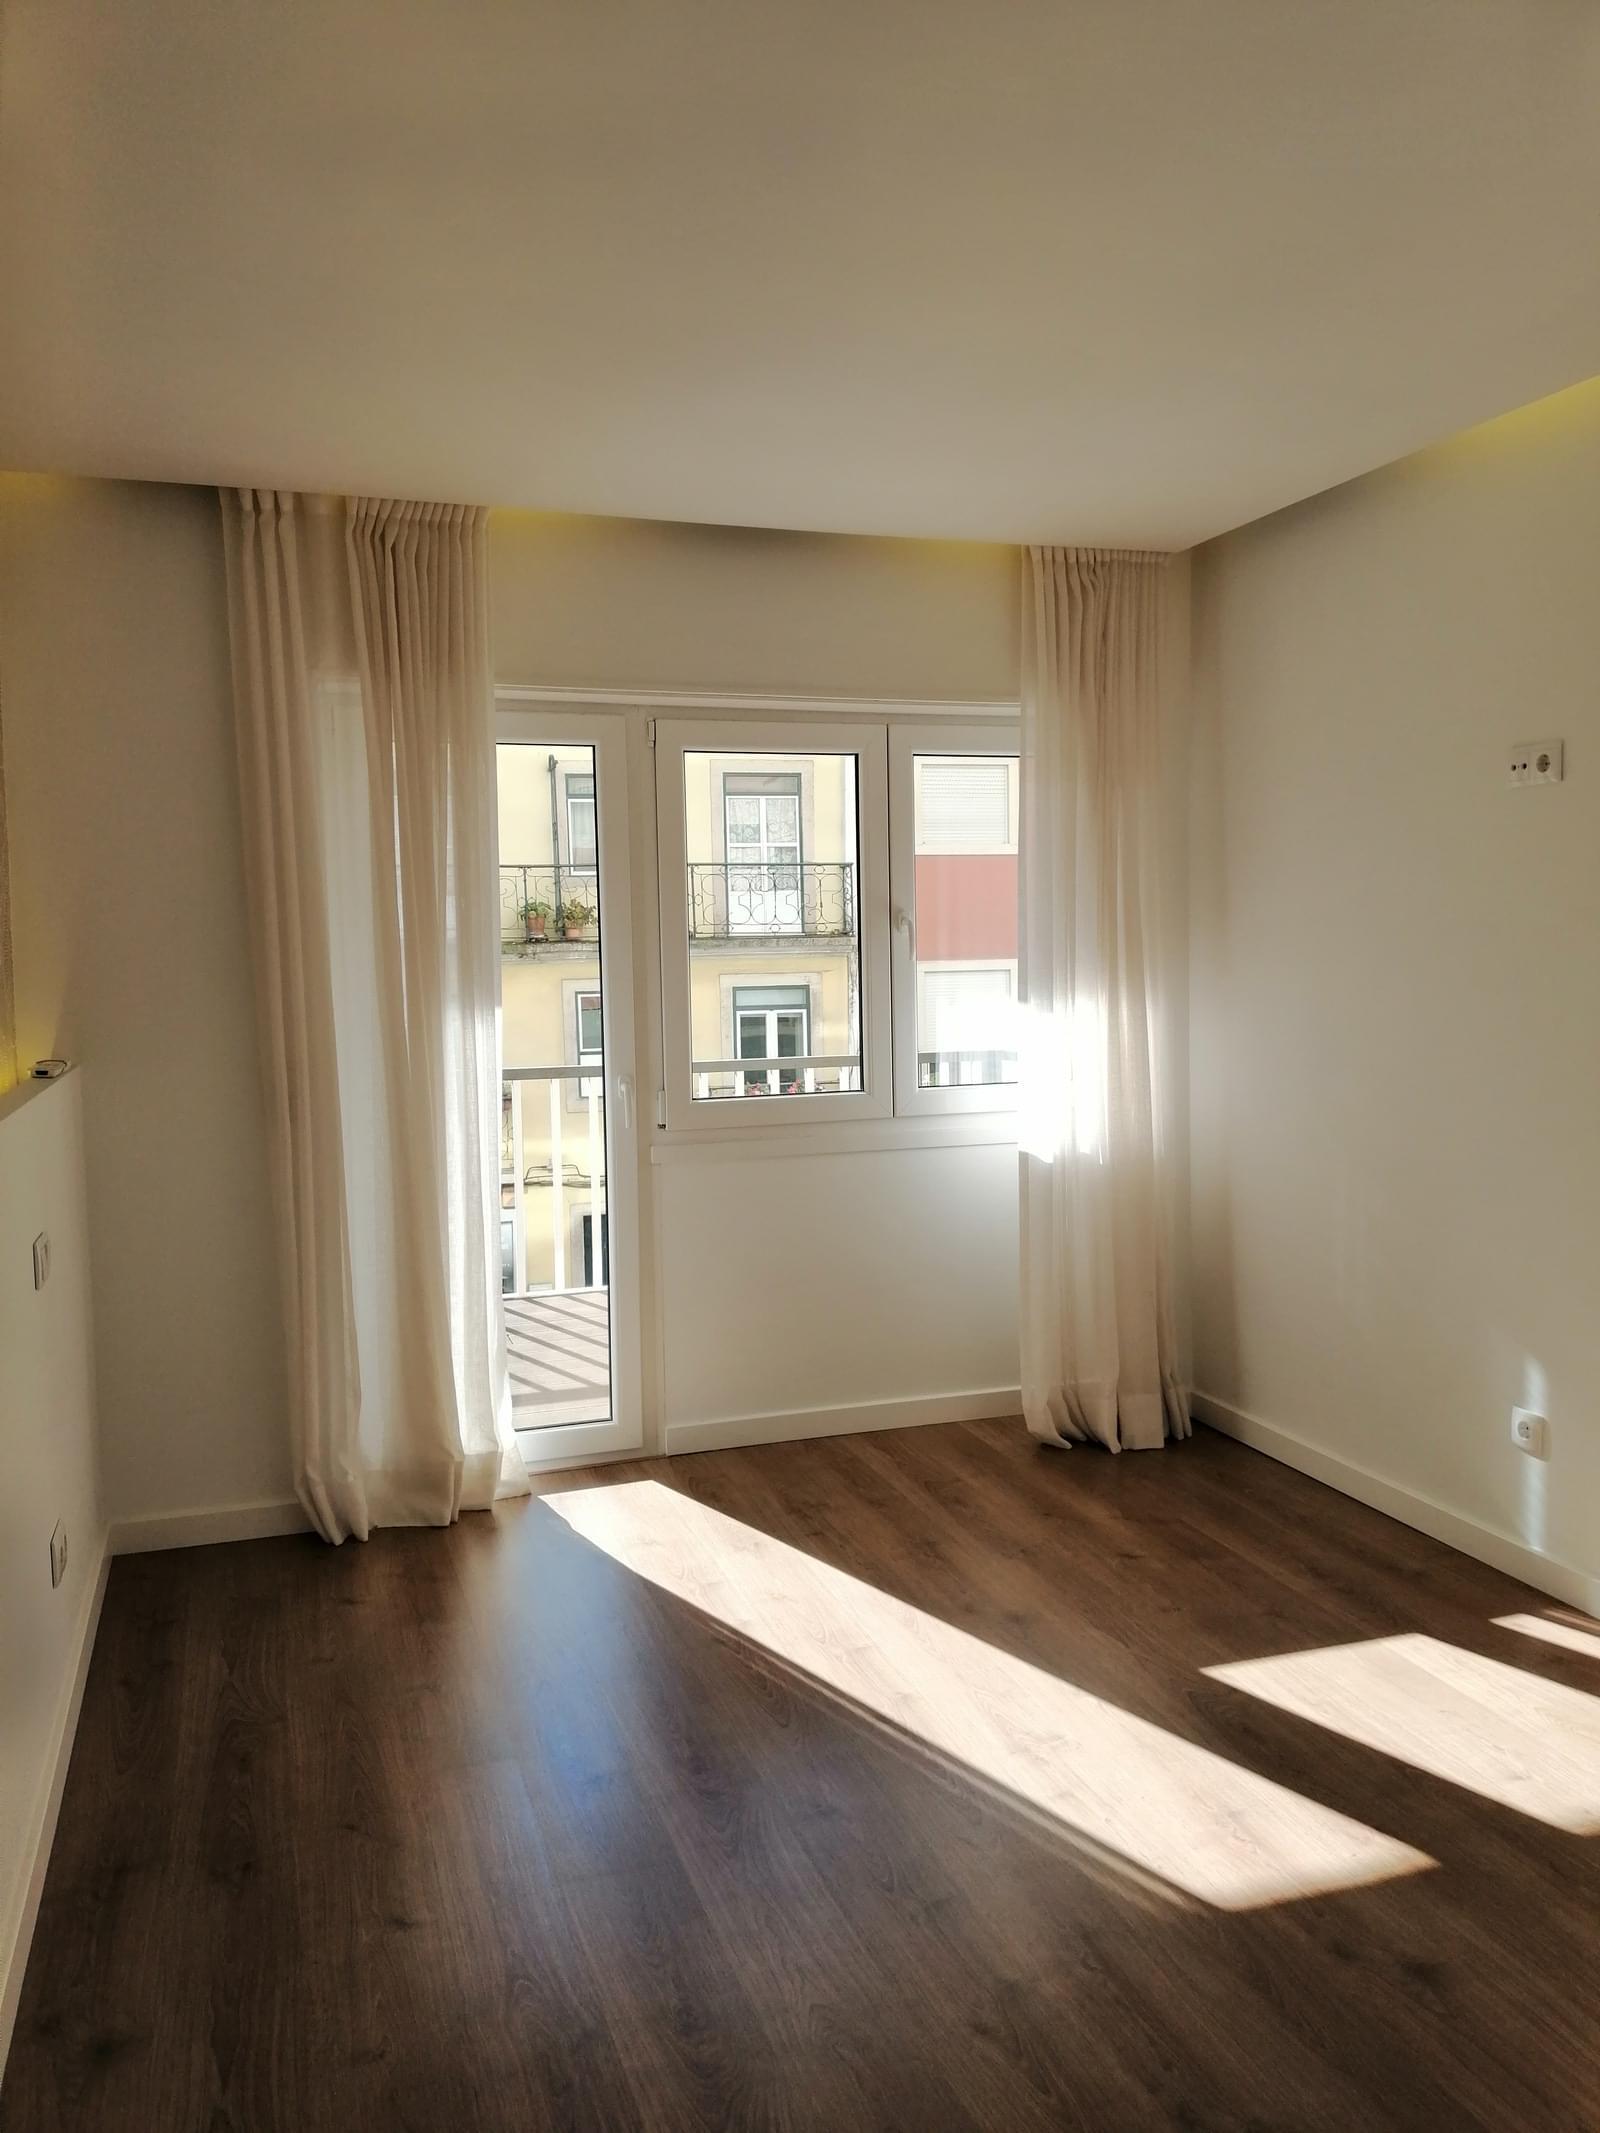 pf18996-apartamento-t3-lisboa-82eed182-2790-401a-9c05-82ce6838ea29